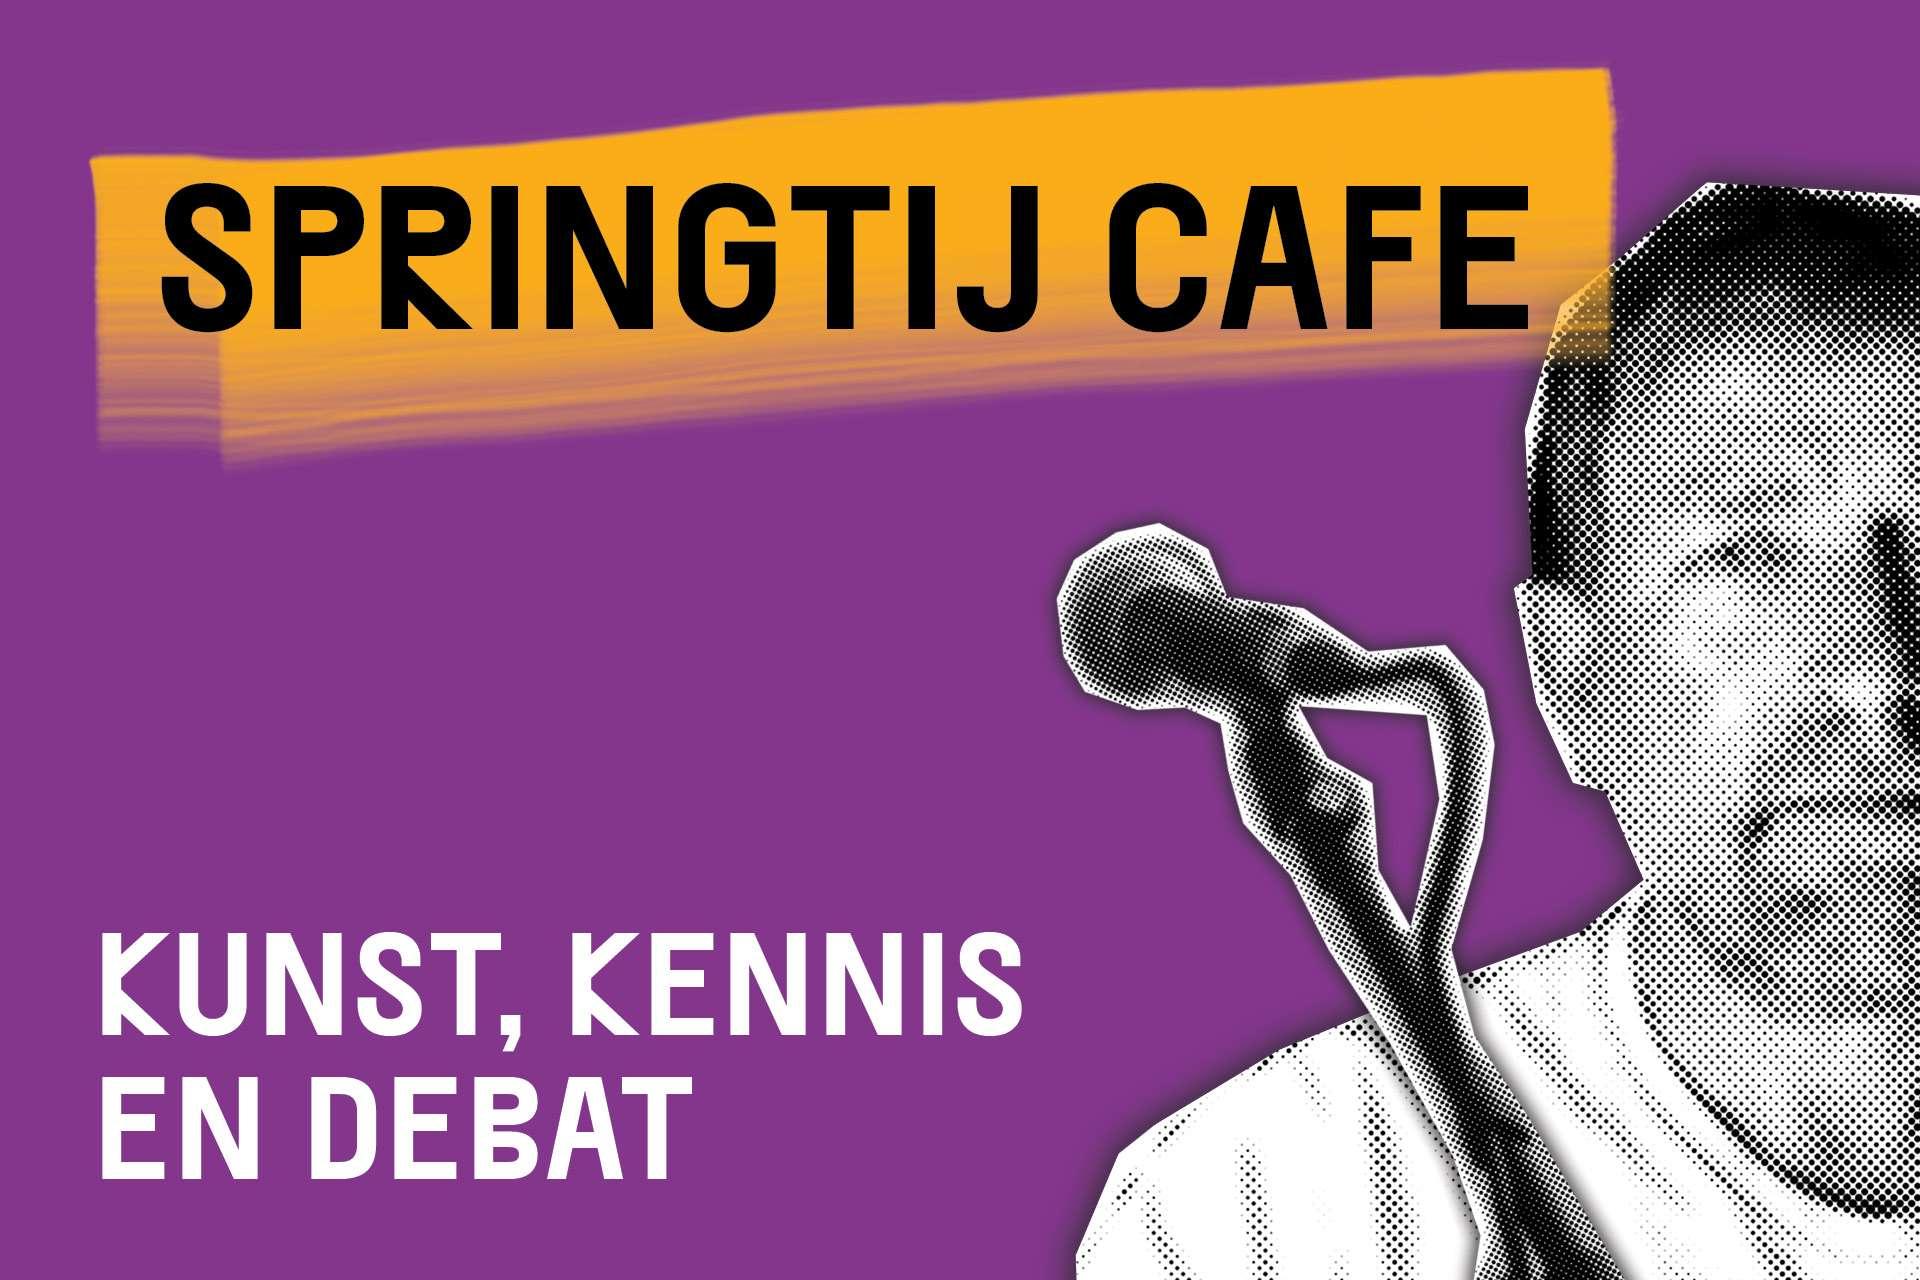 Springtij Café, kunst, kennis en debat